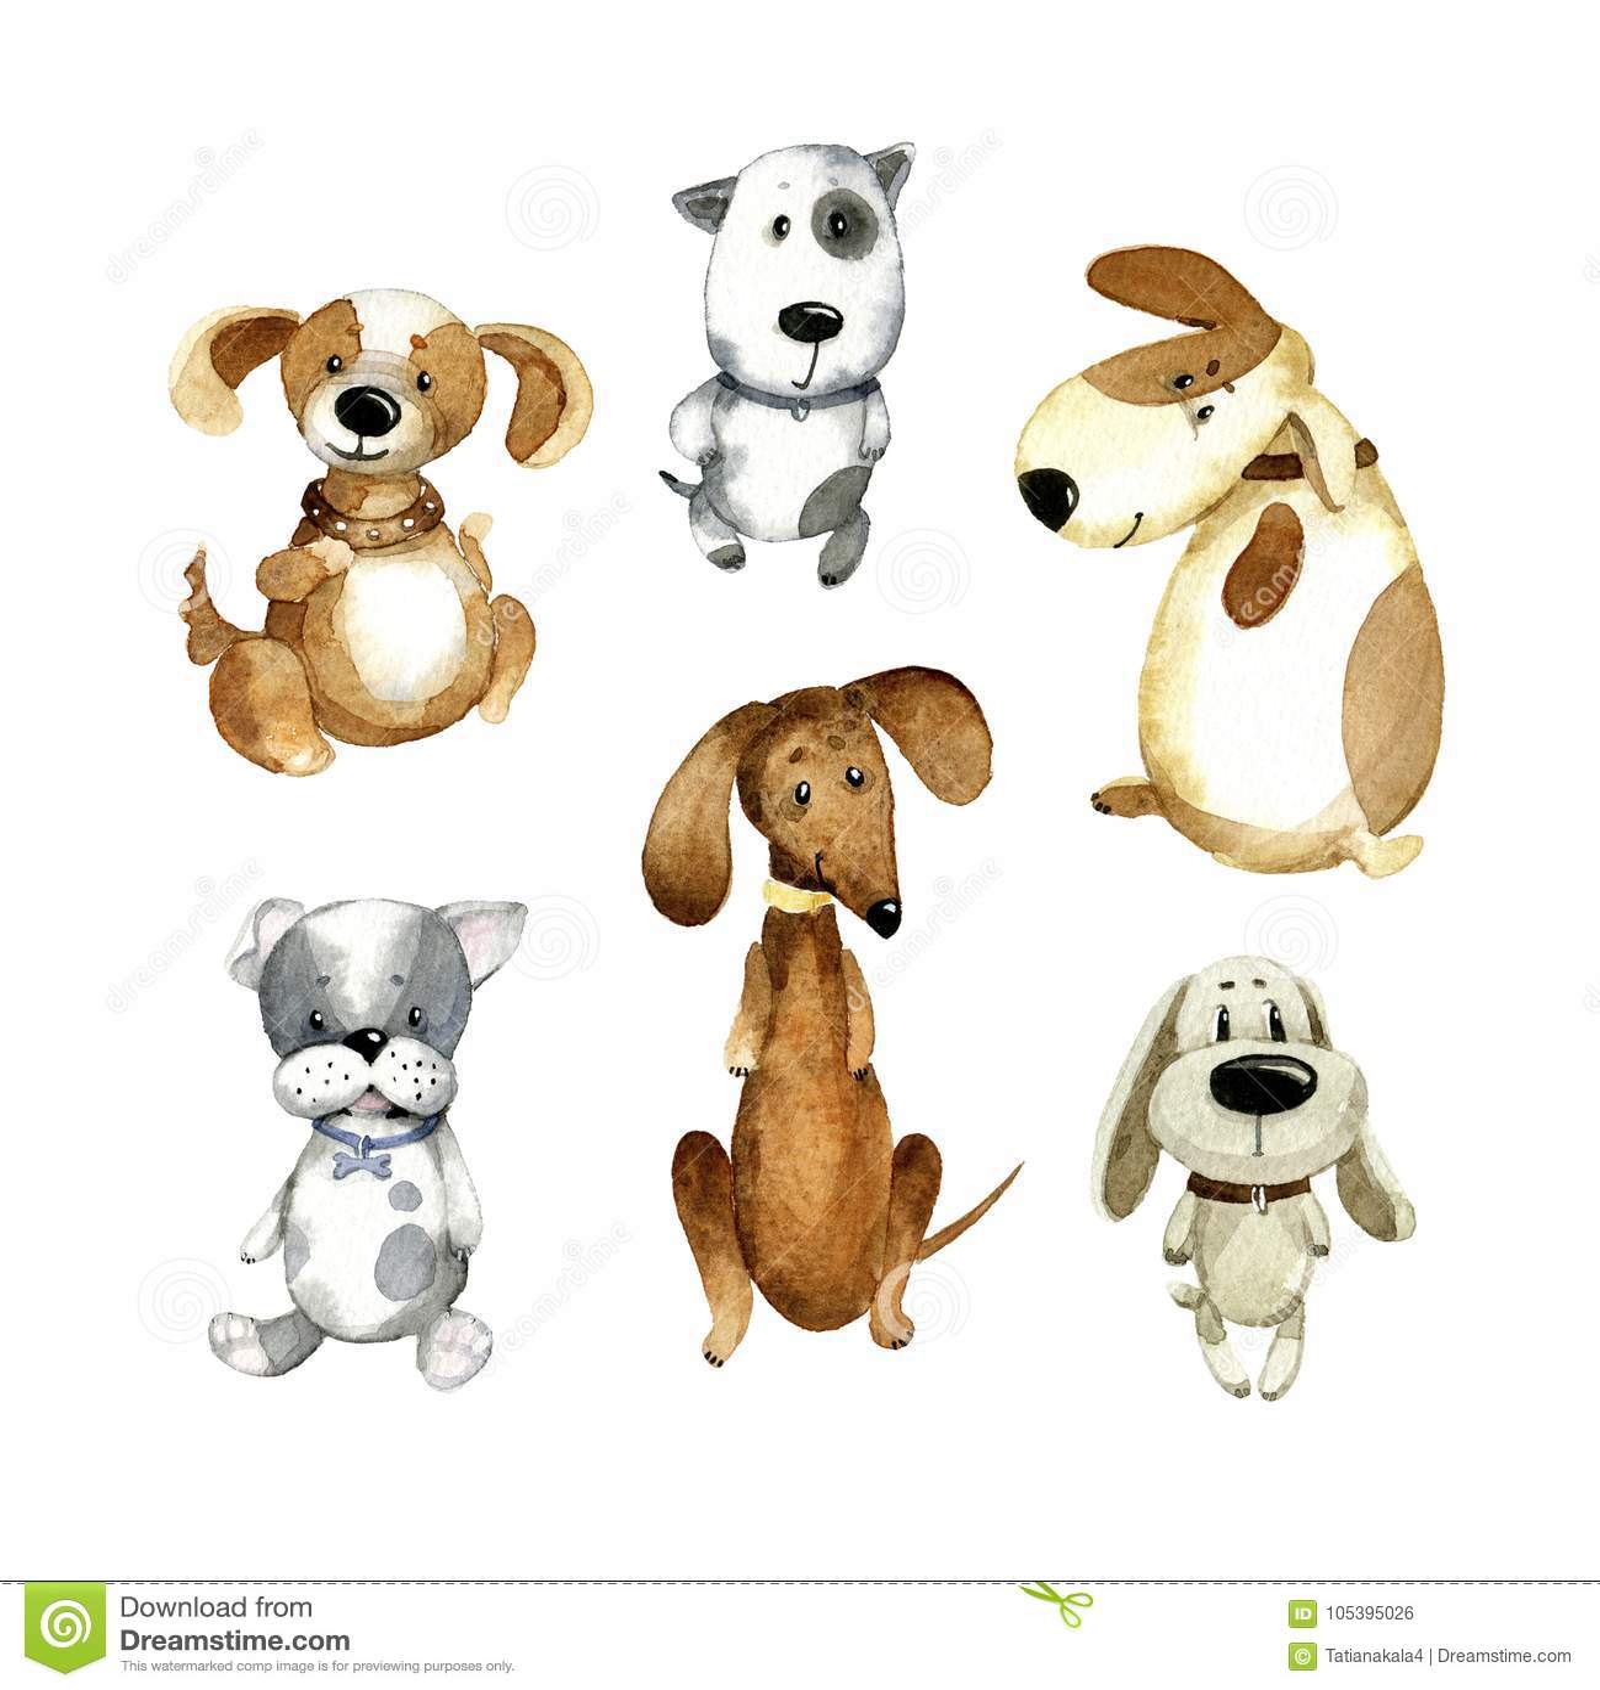 Watercolor Cartoon Illustration Set Of Cute Cartoon Dogs Stock Illustration Illustration Of Background Dogs 105395026